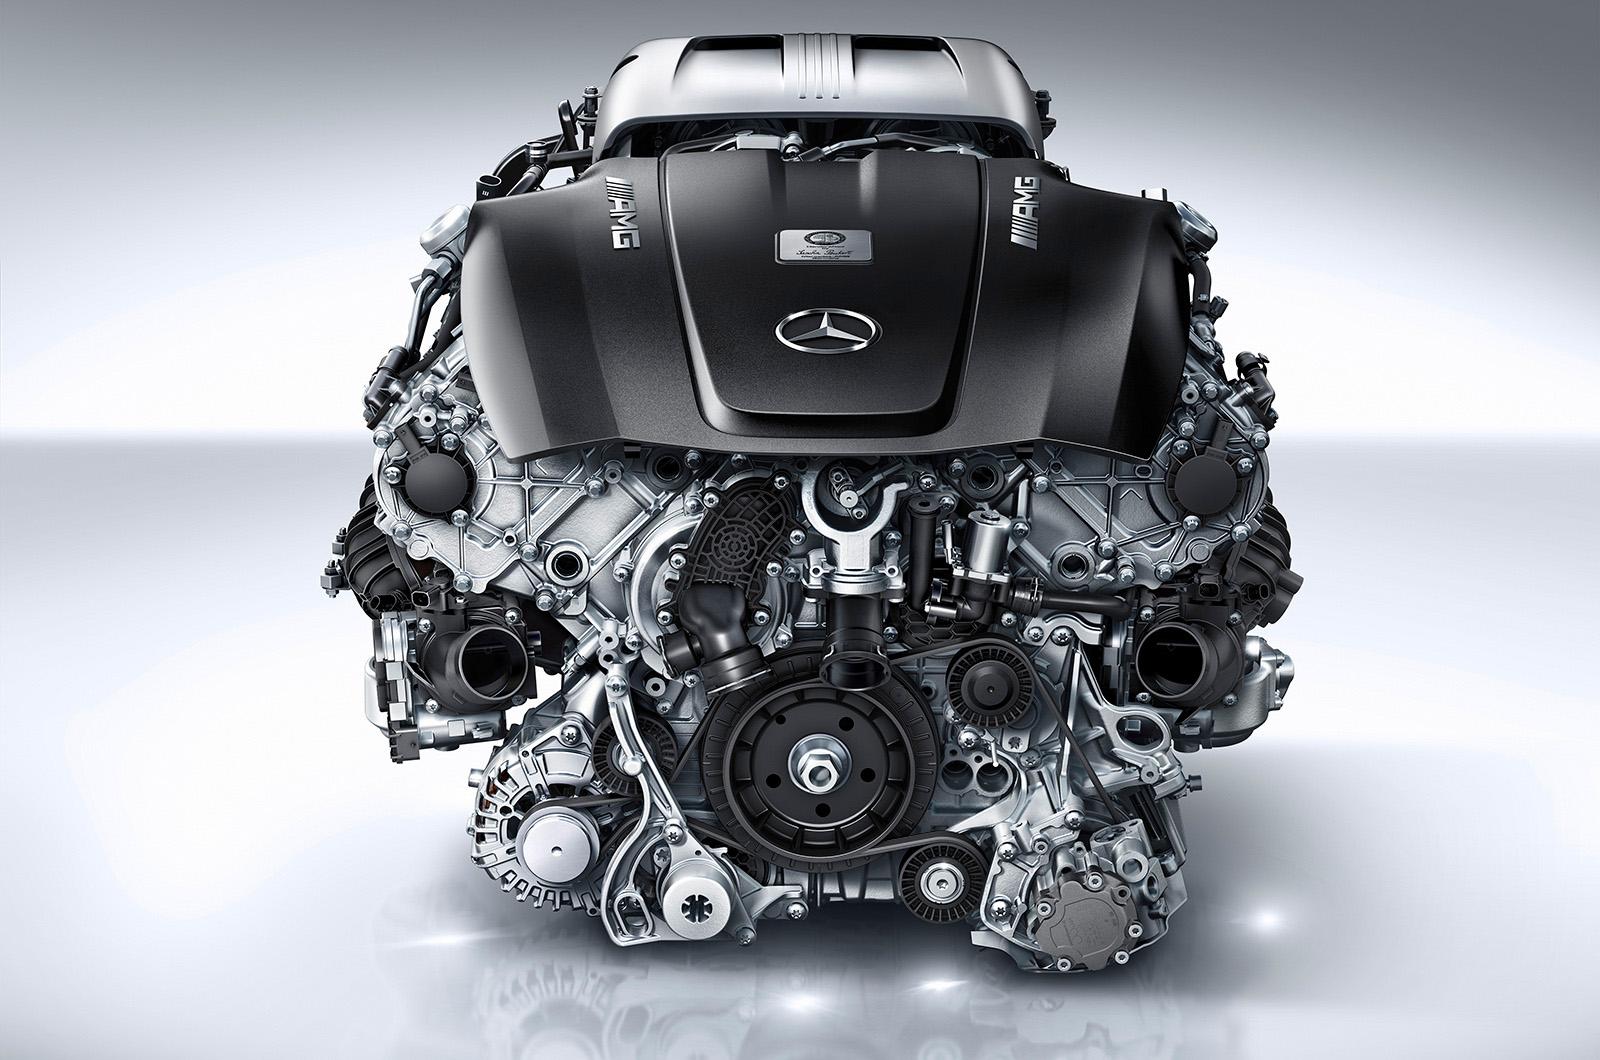 merc-amg-engine-1-0019